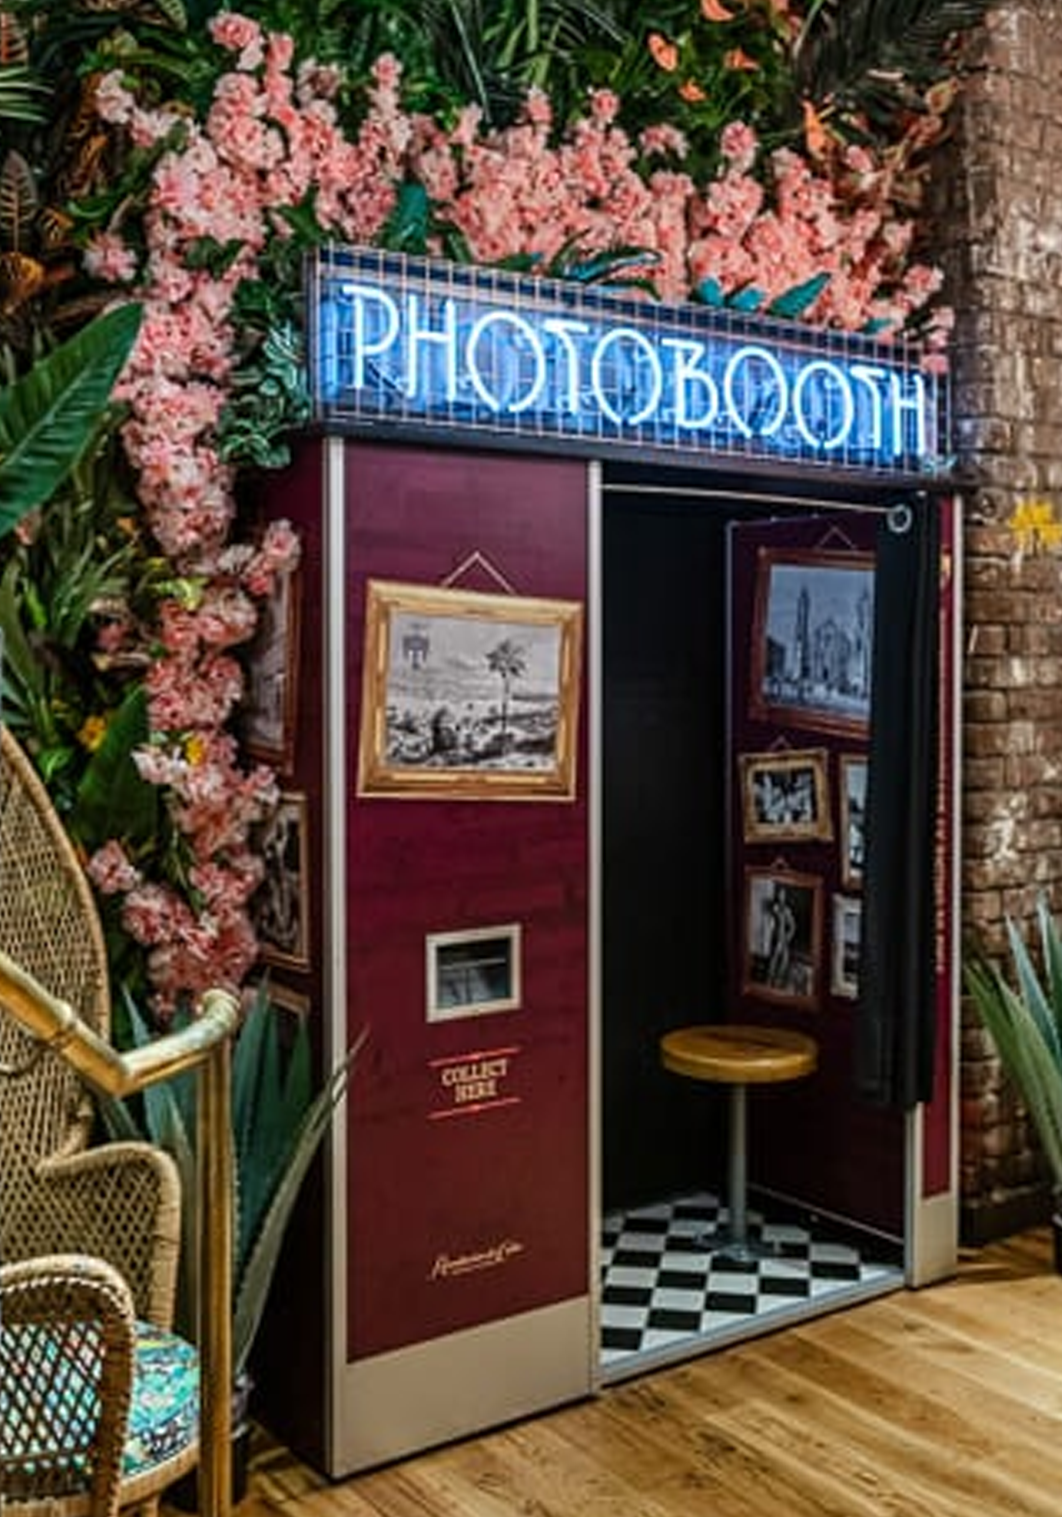 Manchester Bar Photo Booth